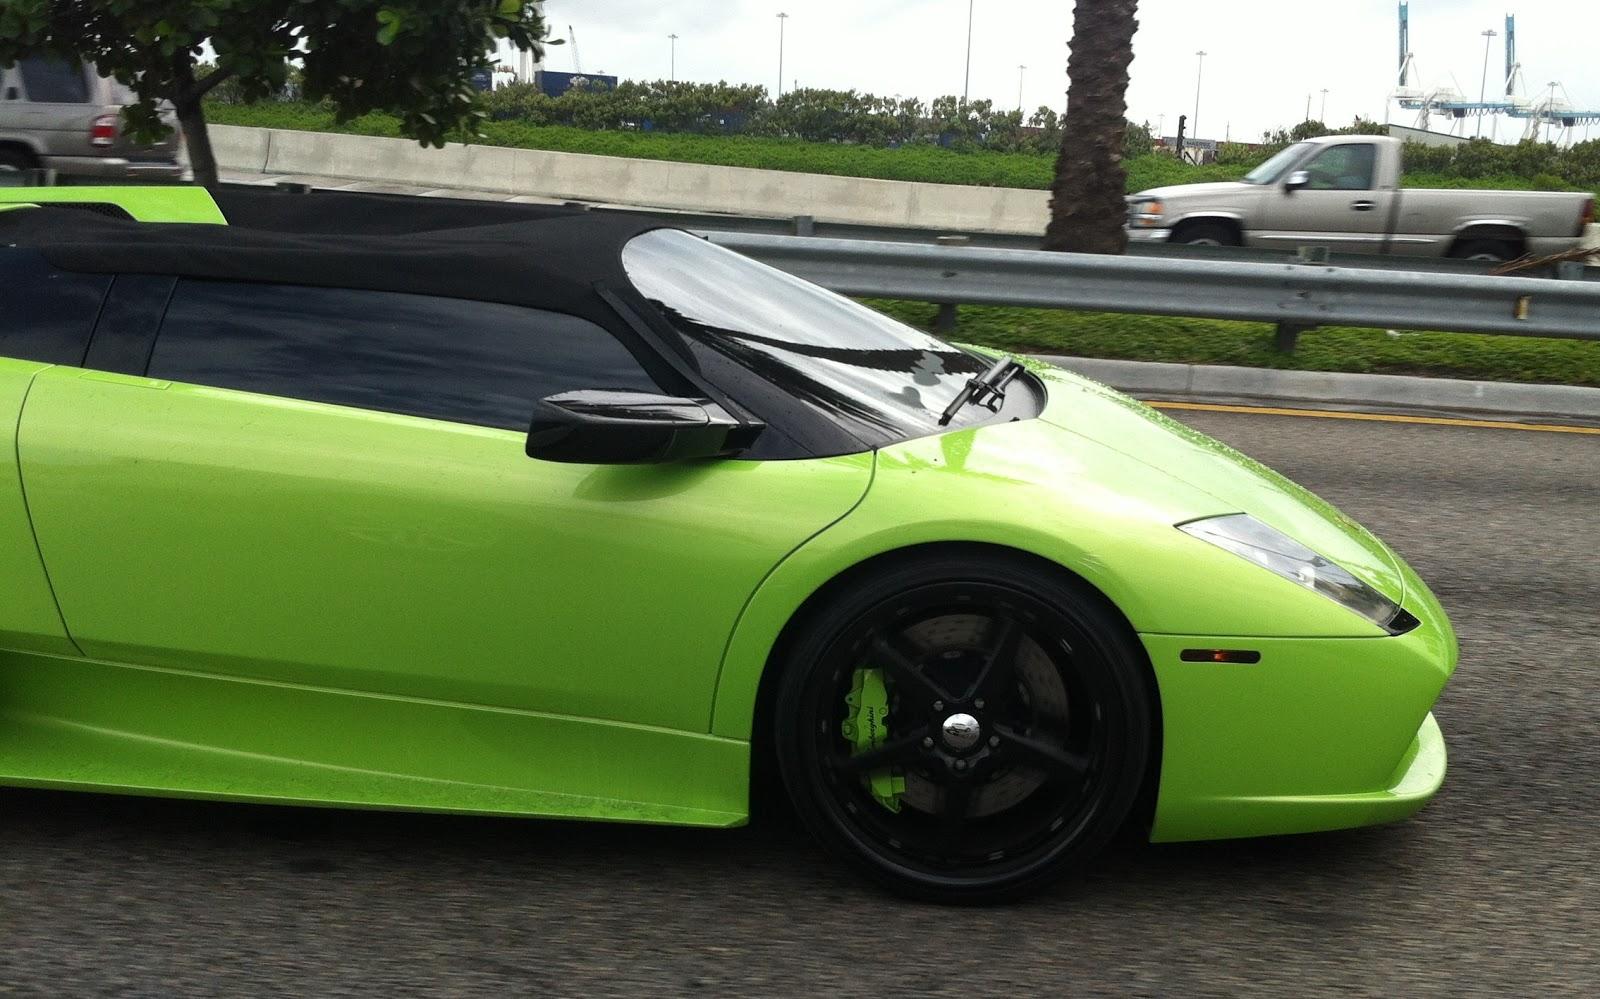 Green Lamborghini Murcielago Roadster Miami Beach Exotic Cars On